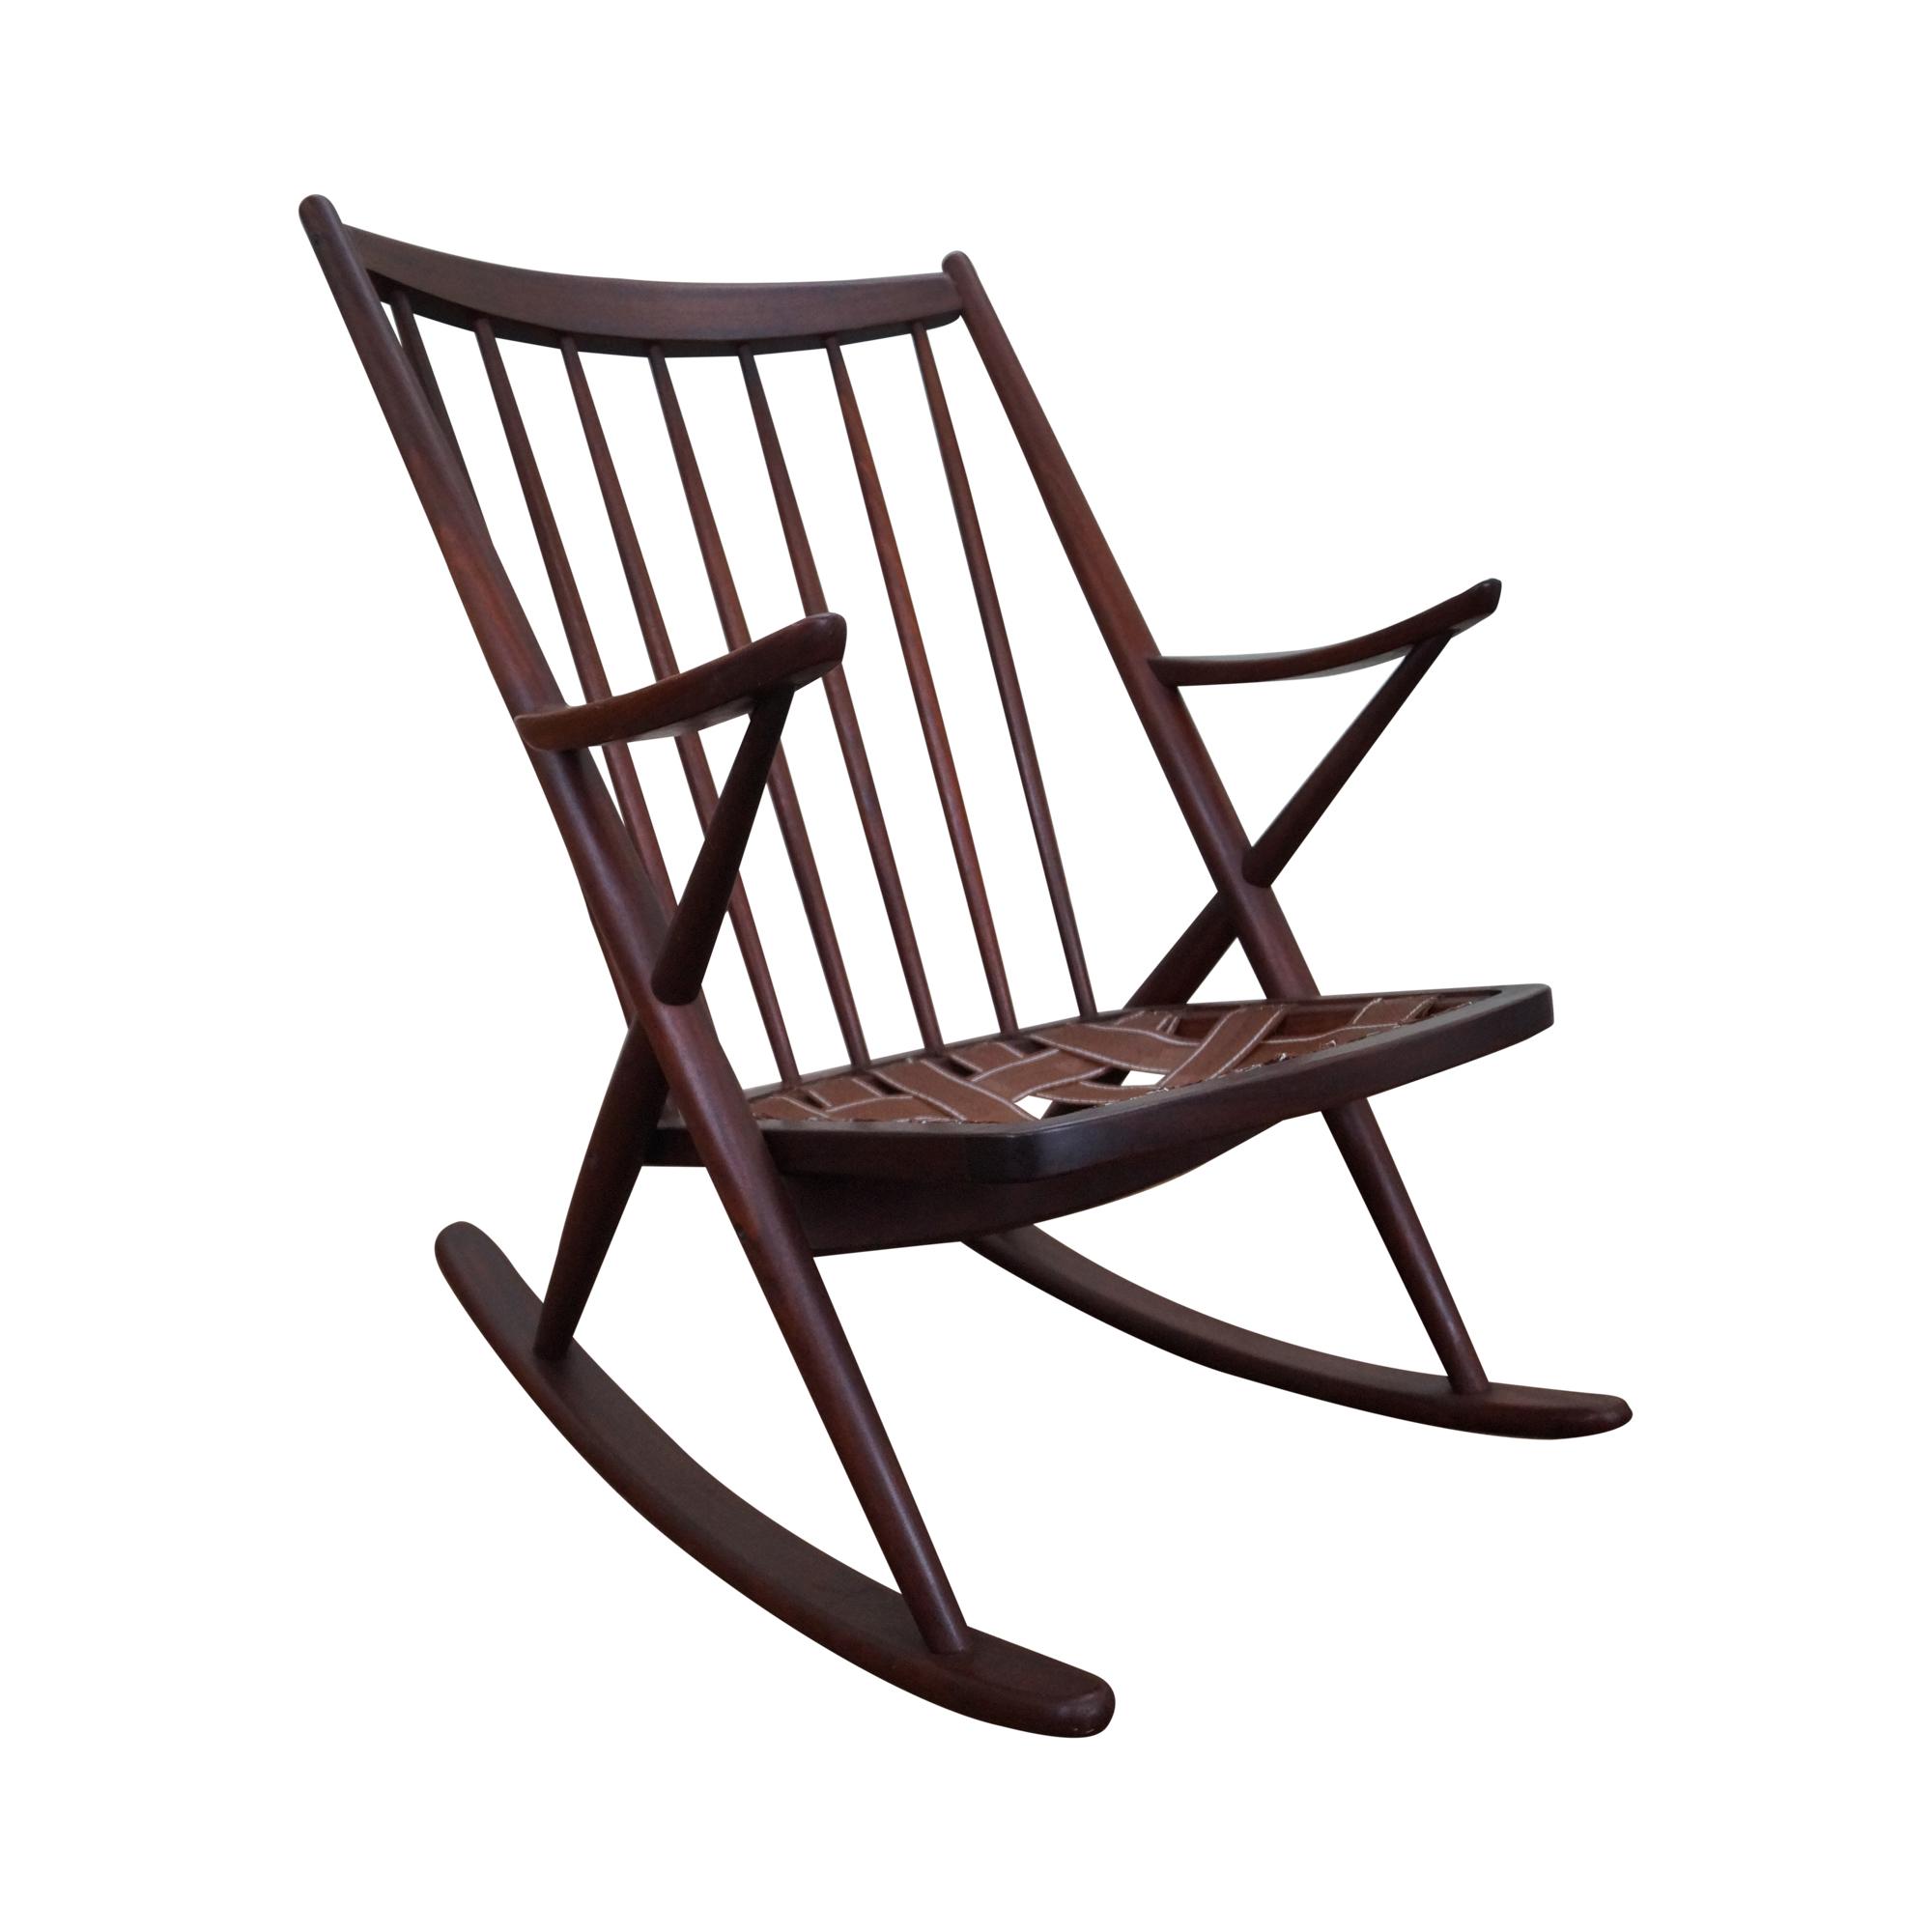 Frank reenskaug rocking chair - Frank Reenskaug Rocking Chair 6